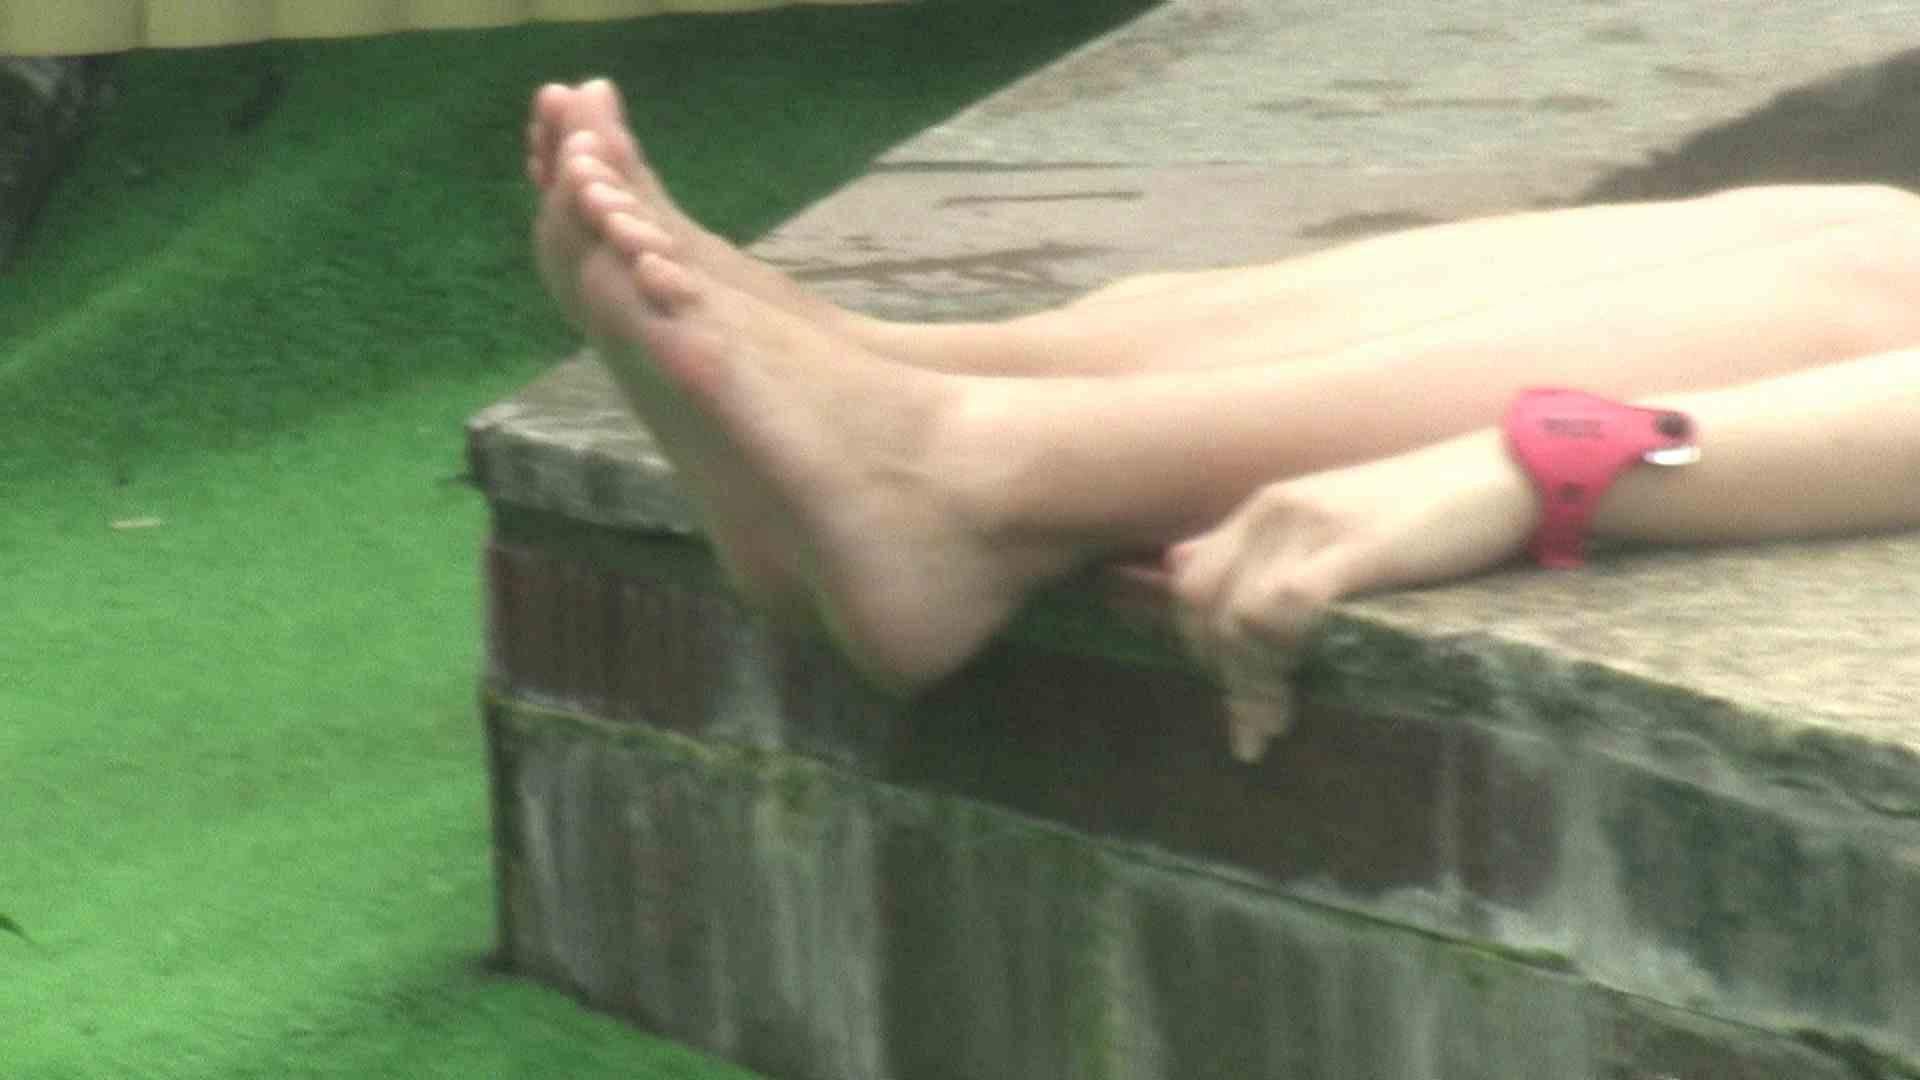 Aquaな露天風呂Vol.192 美しいOLの裸体 えろ無修正画像 101pic 74